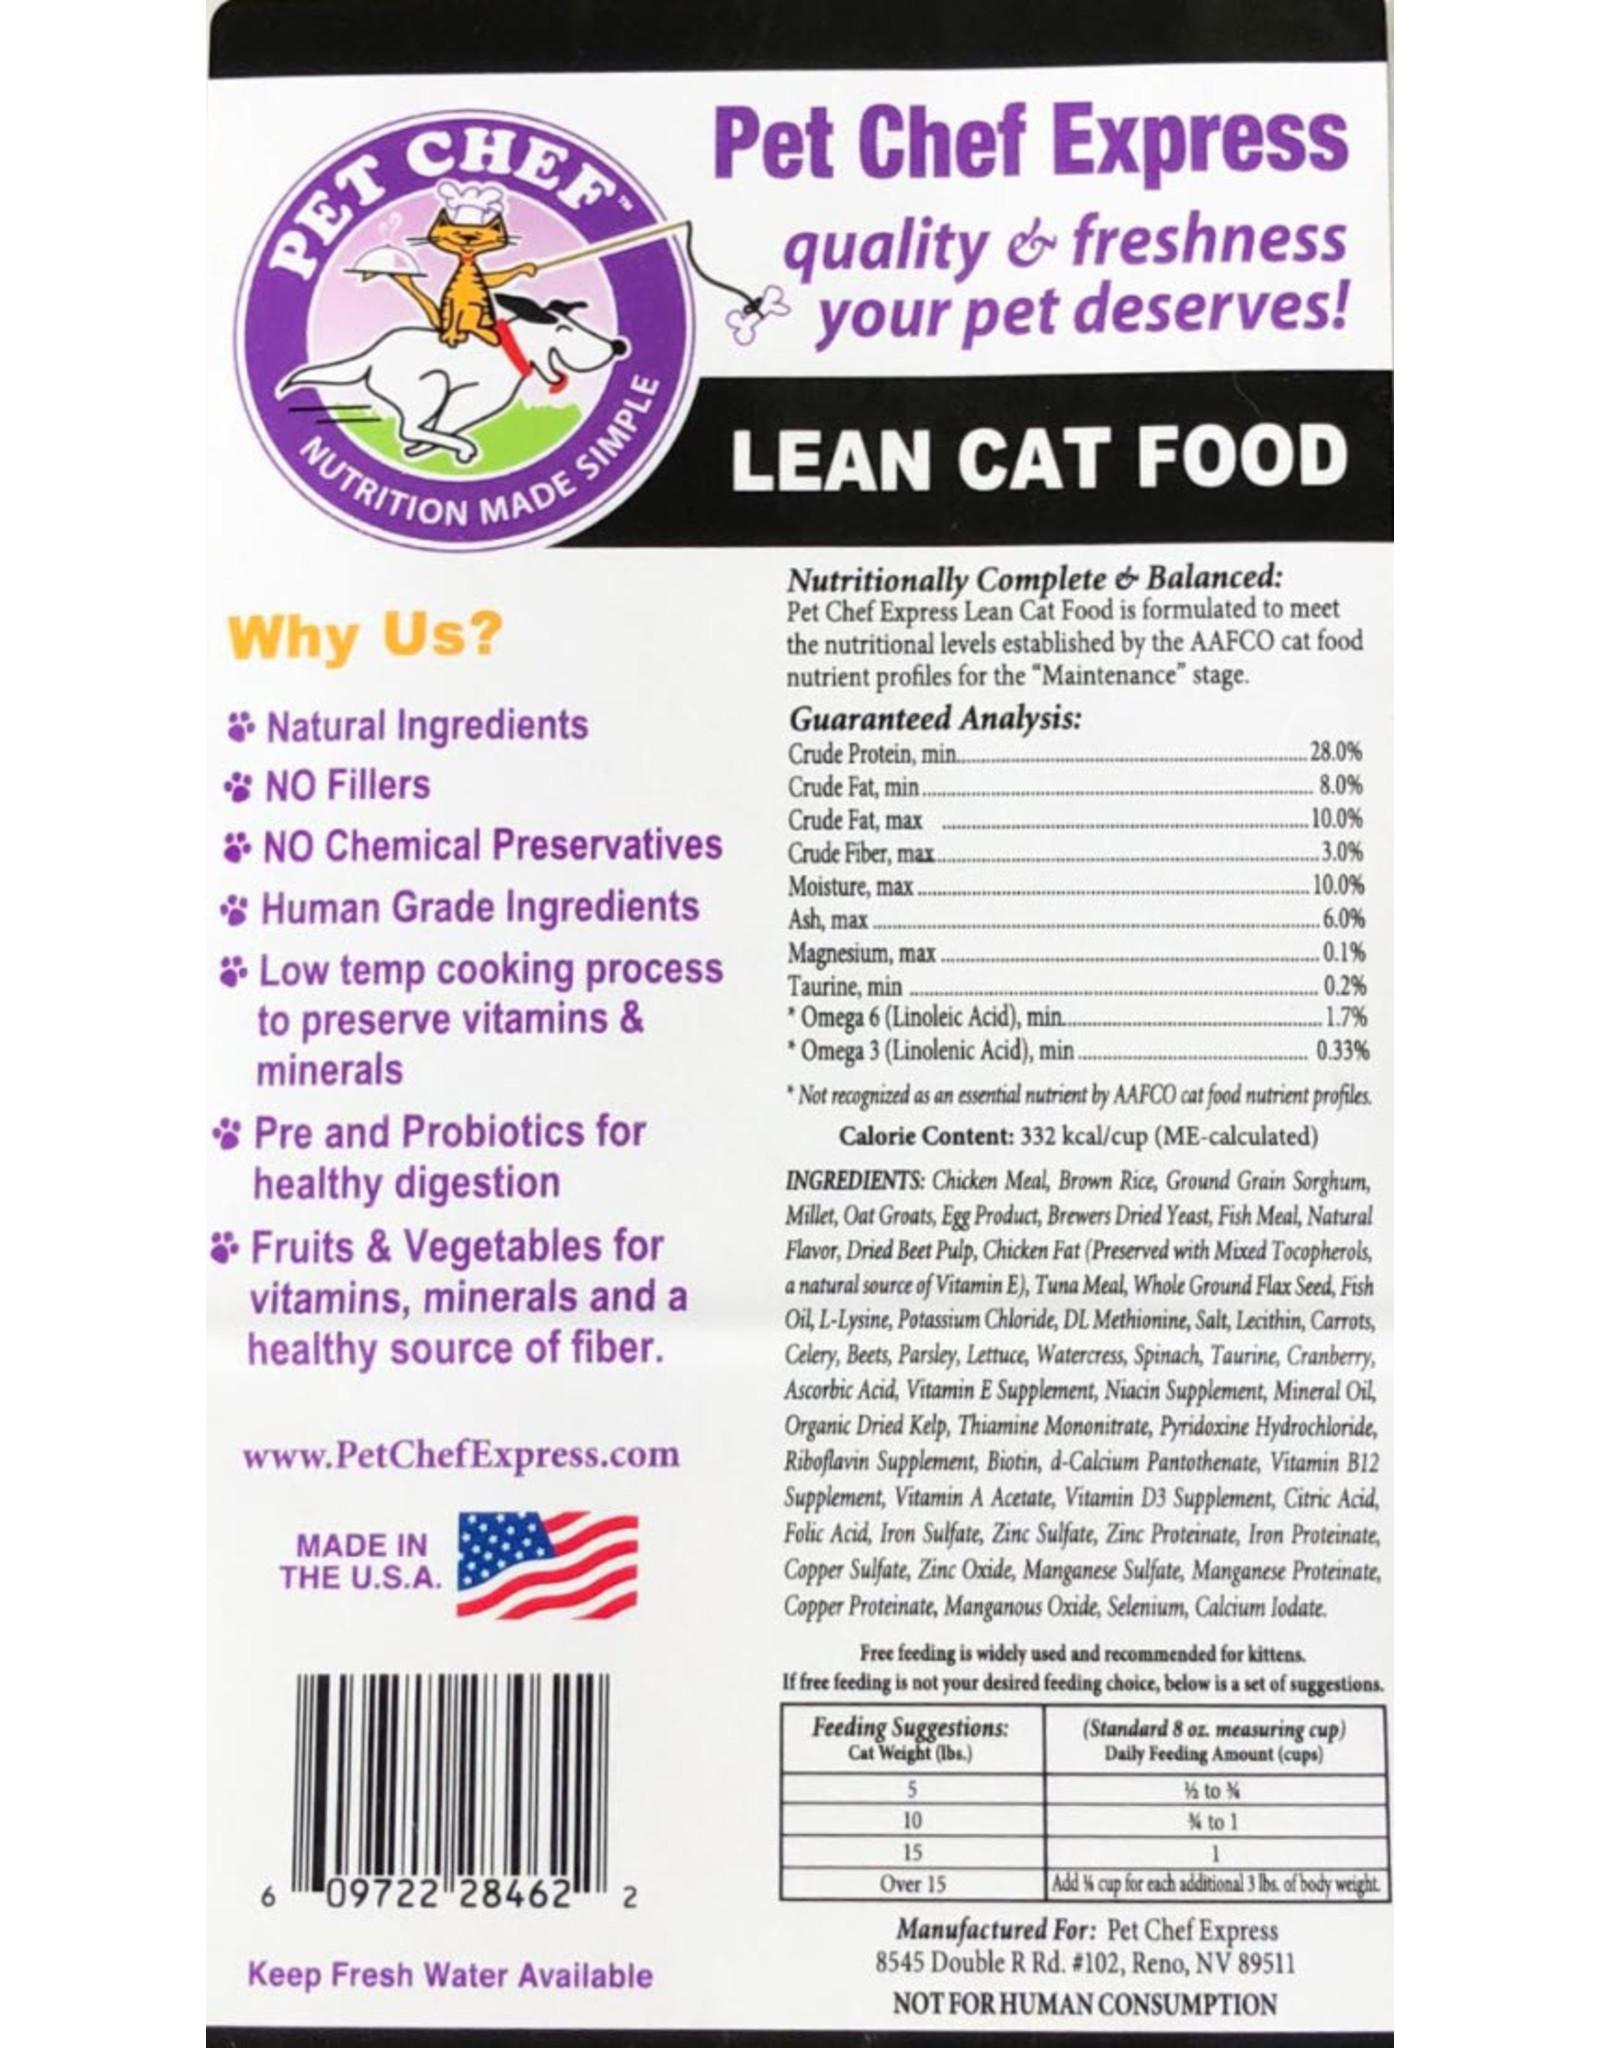 Pet Chef Express Pet Chef Lean Cat